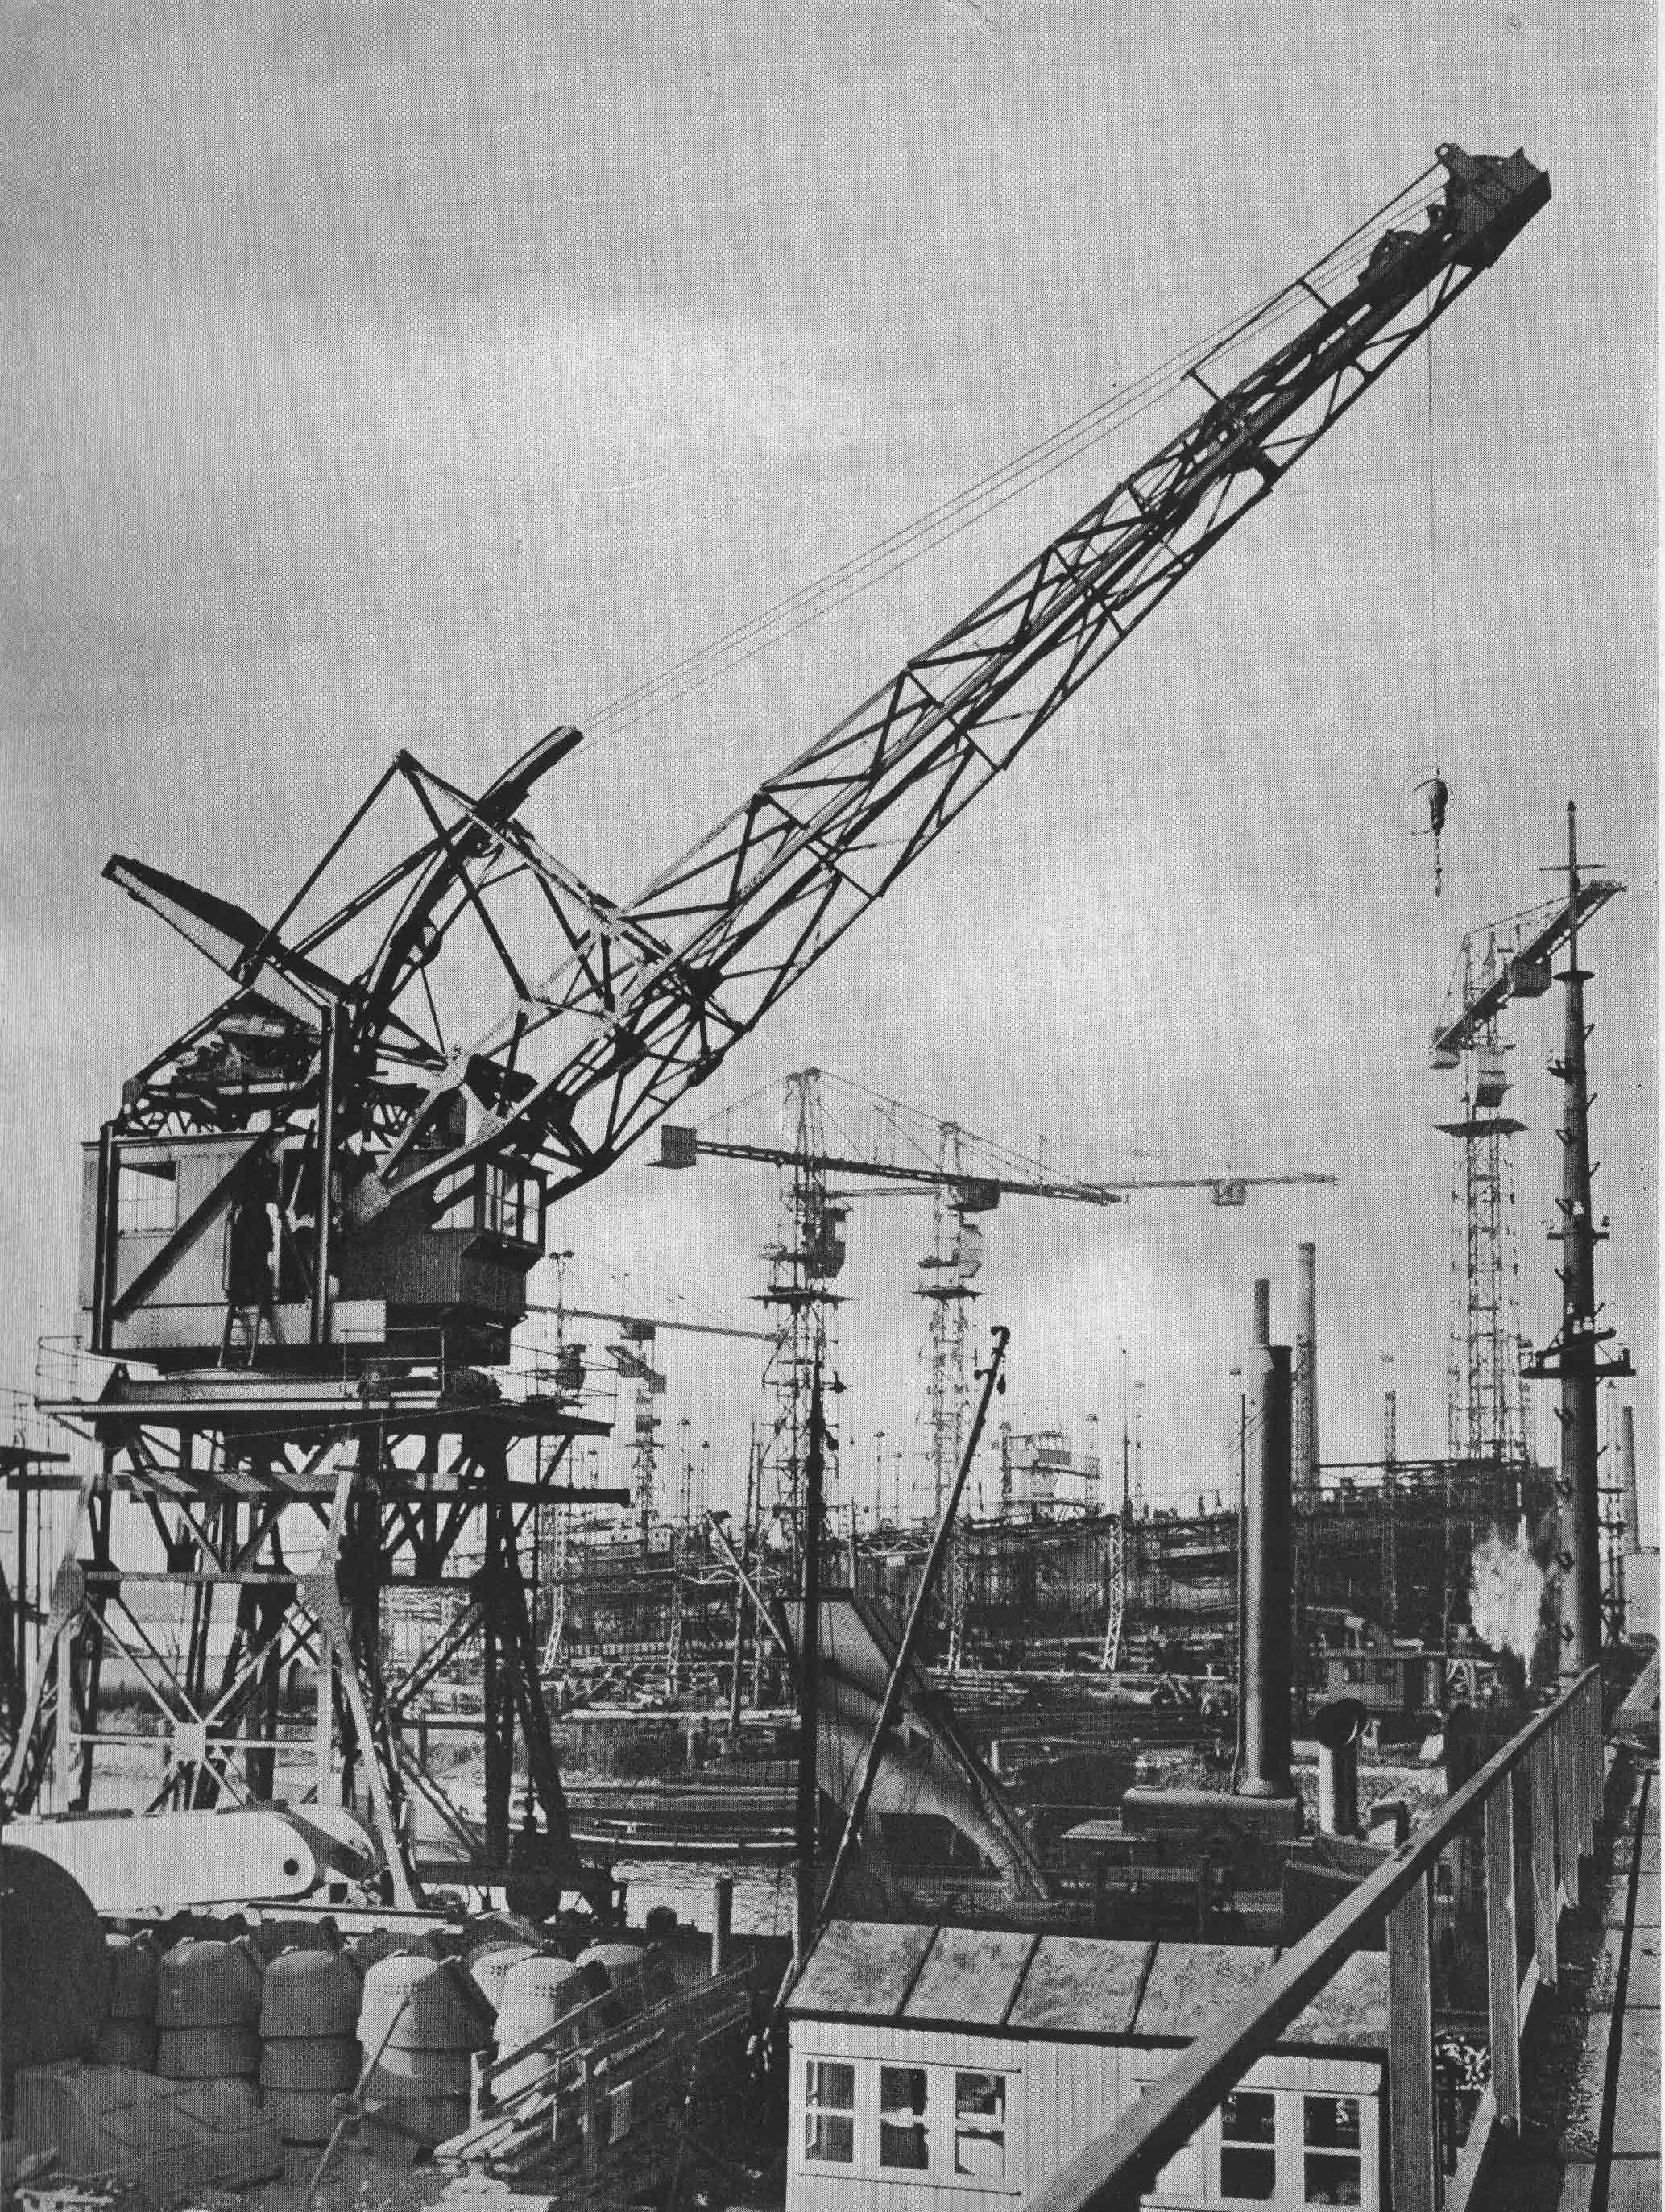 Bnr. 593: Havenkranen (1926)